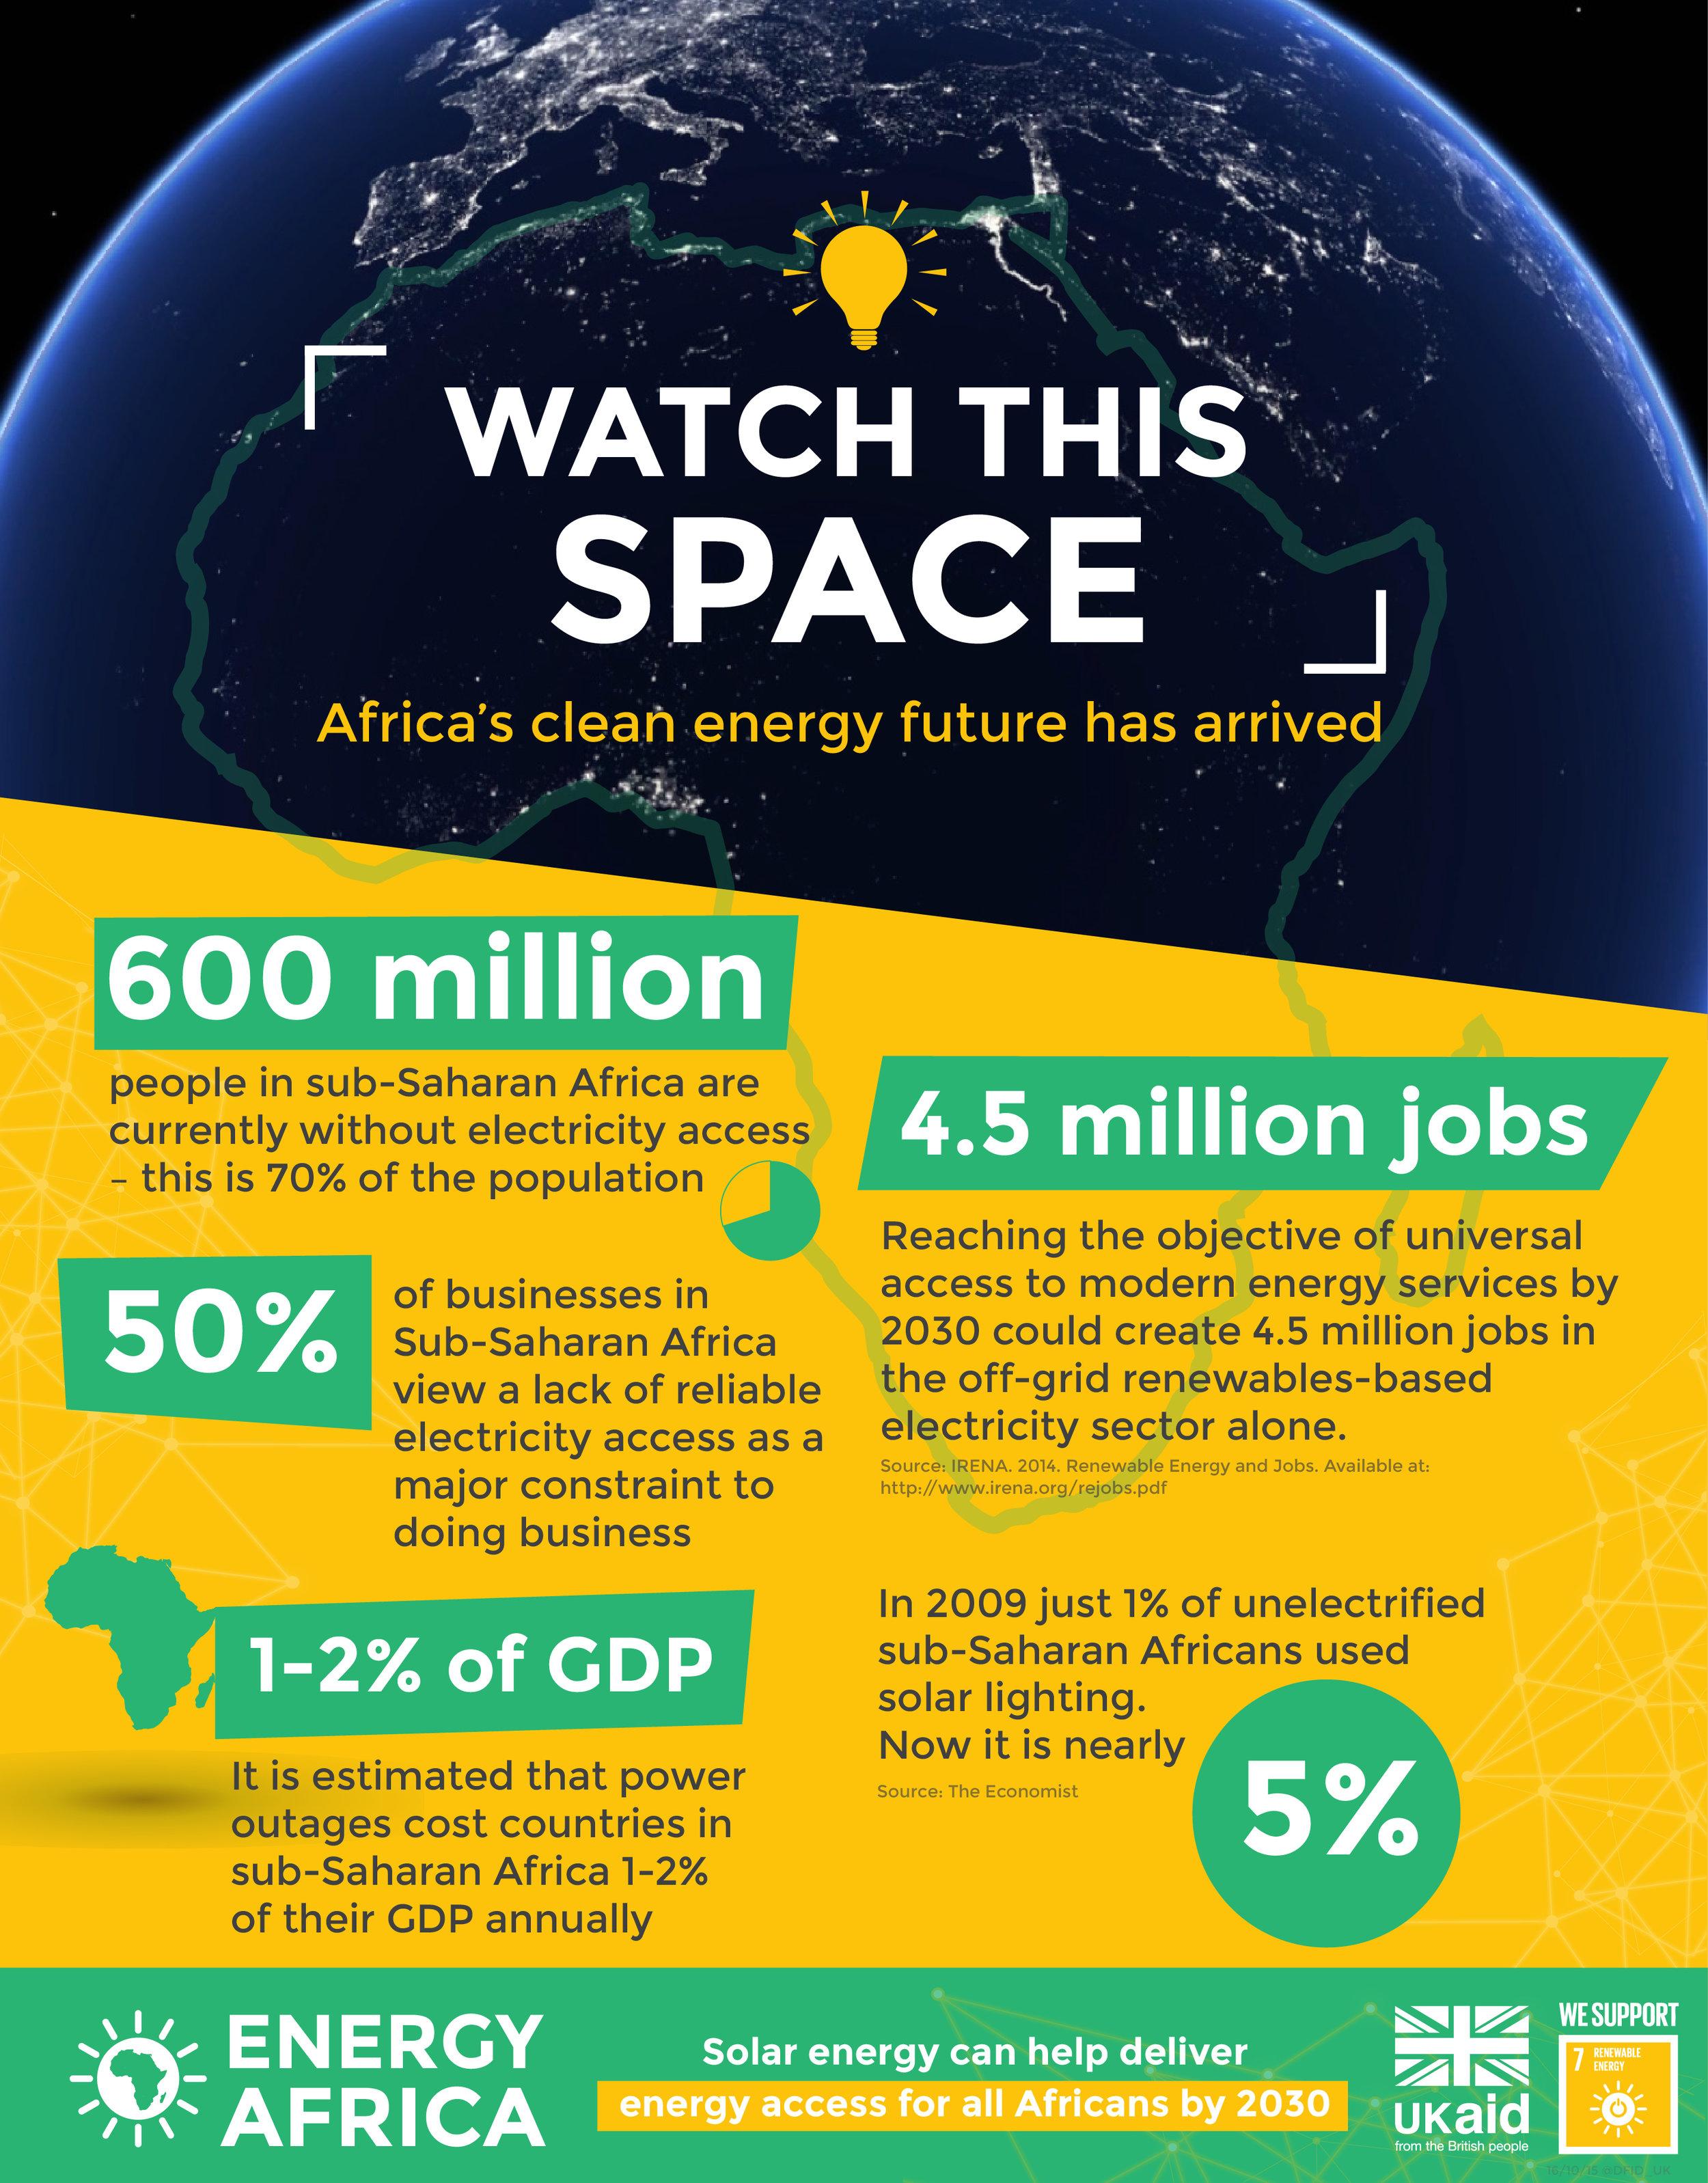 Energy_Africa_Infographic.jpg